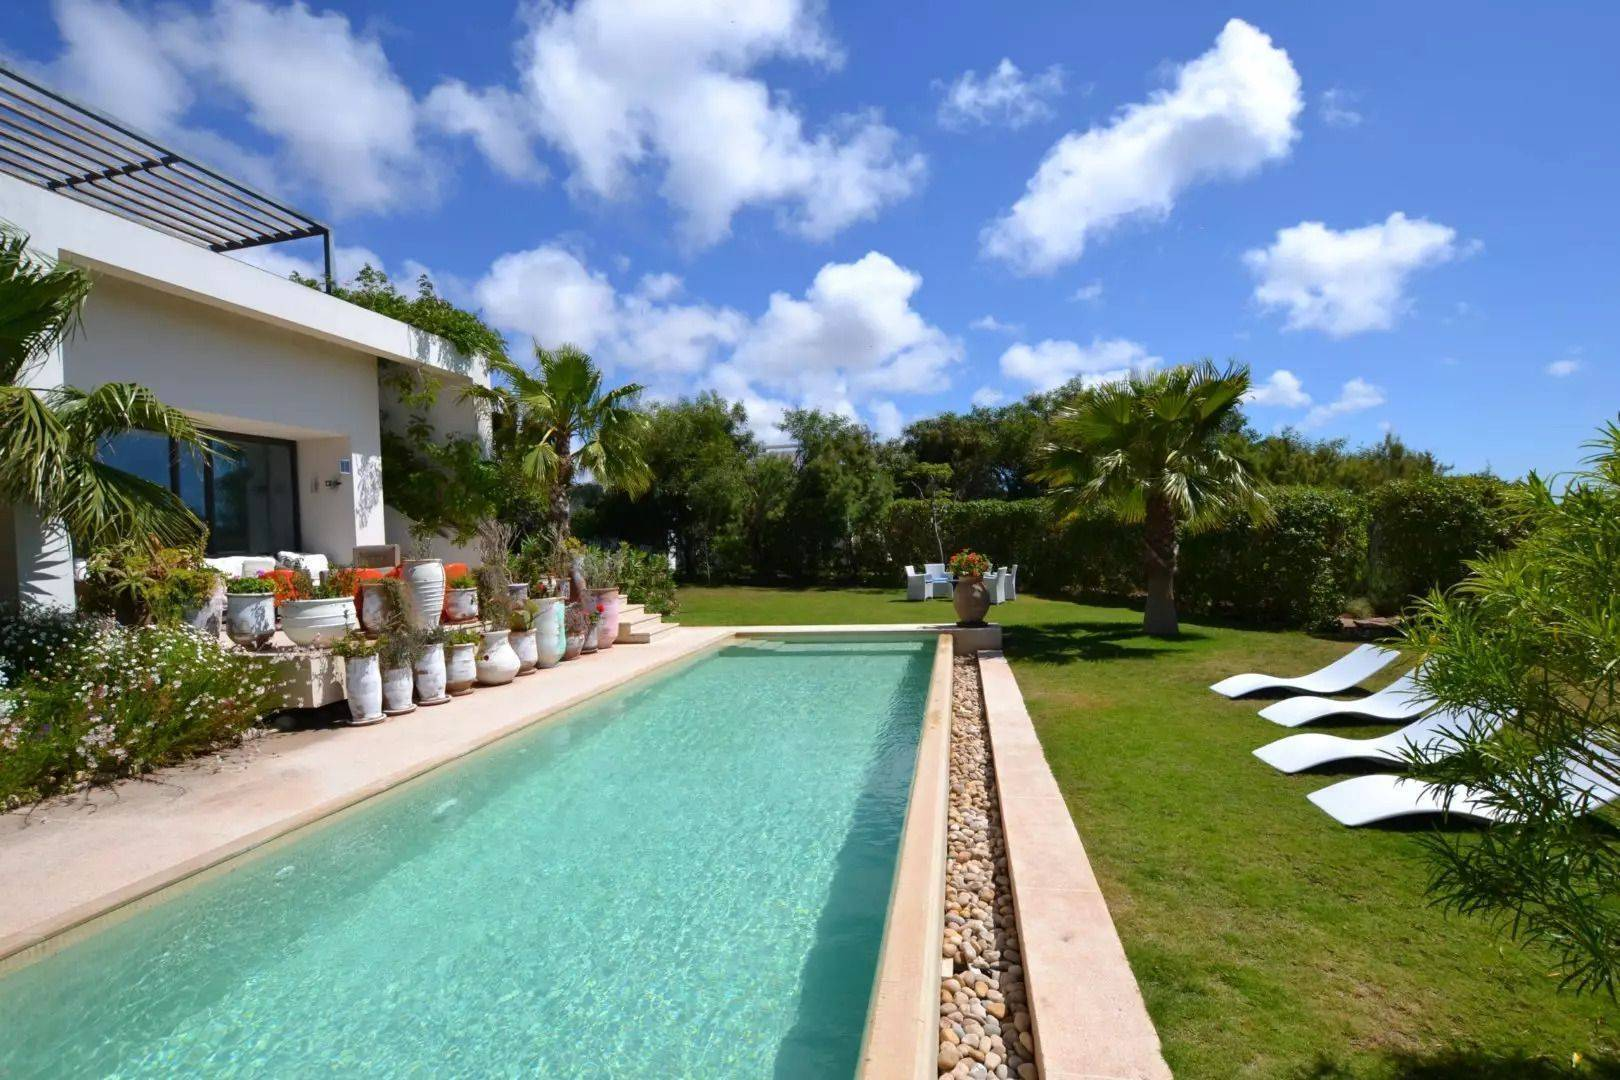 location villa piscine chauffée essaouira (6).jpg